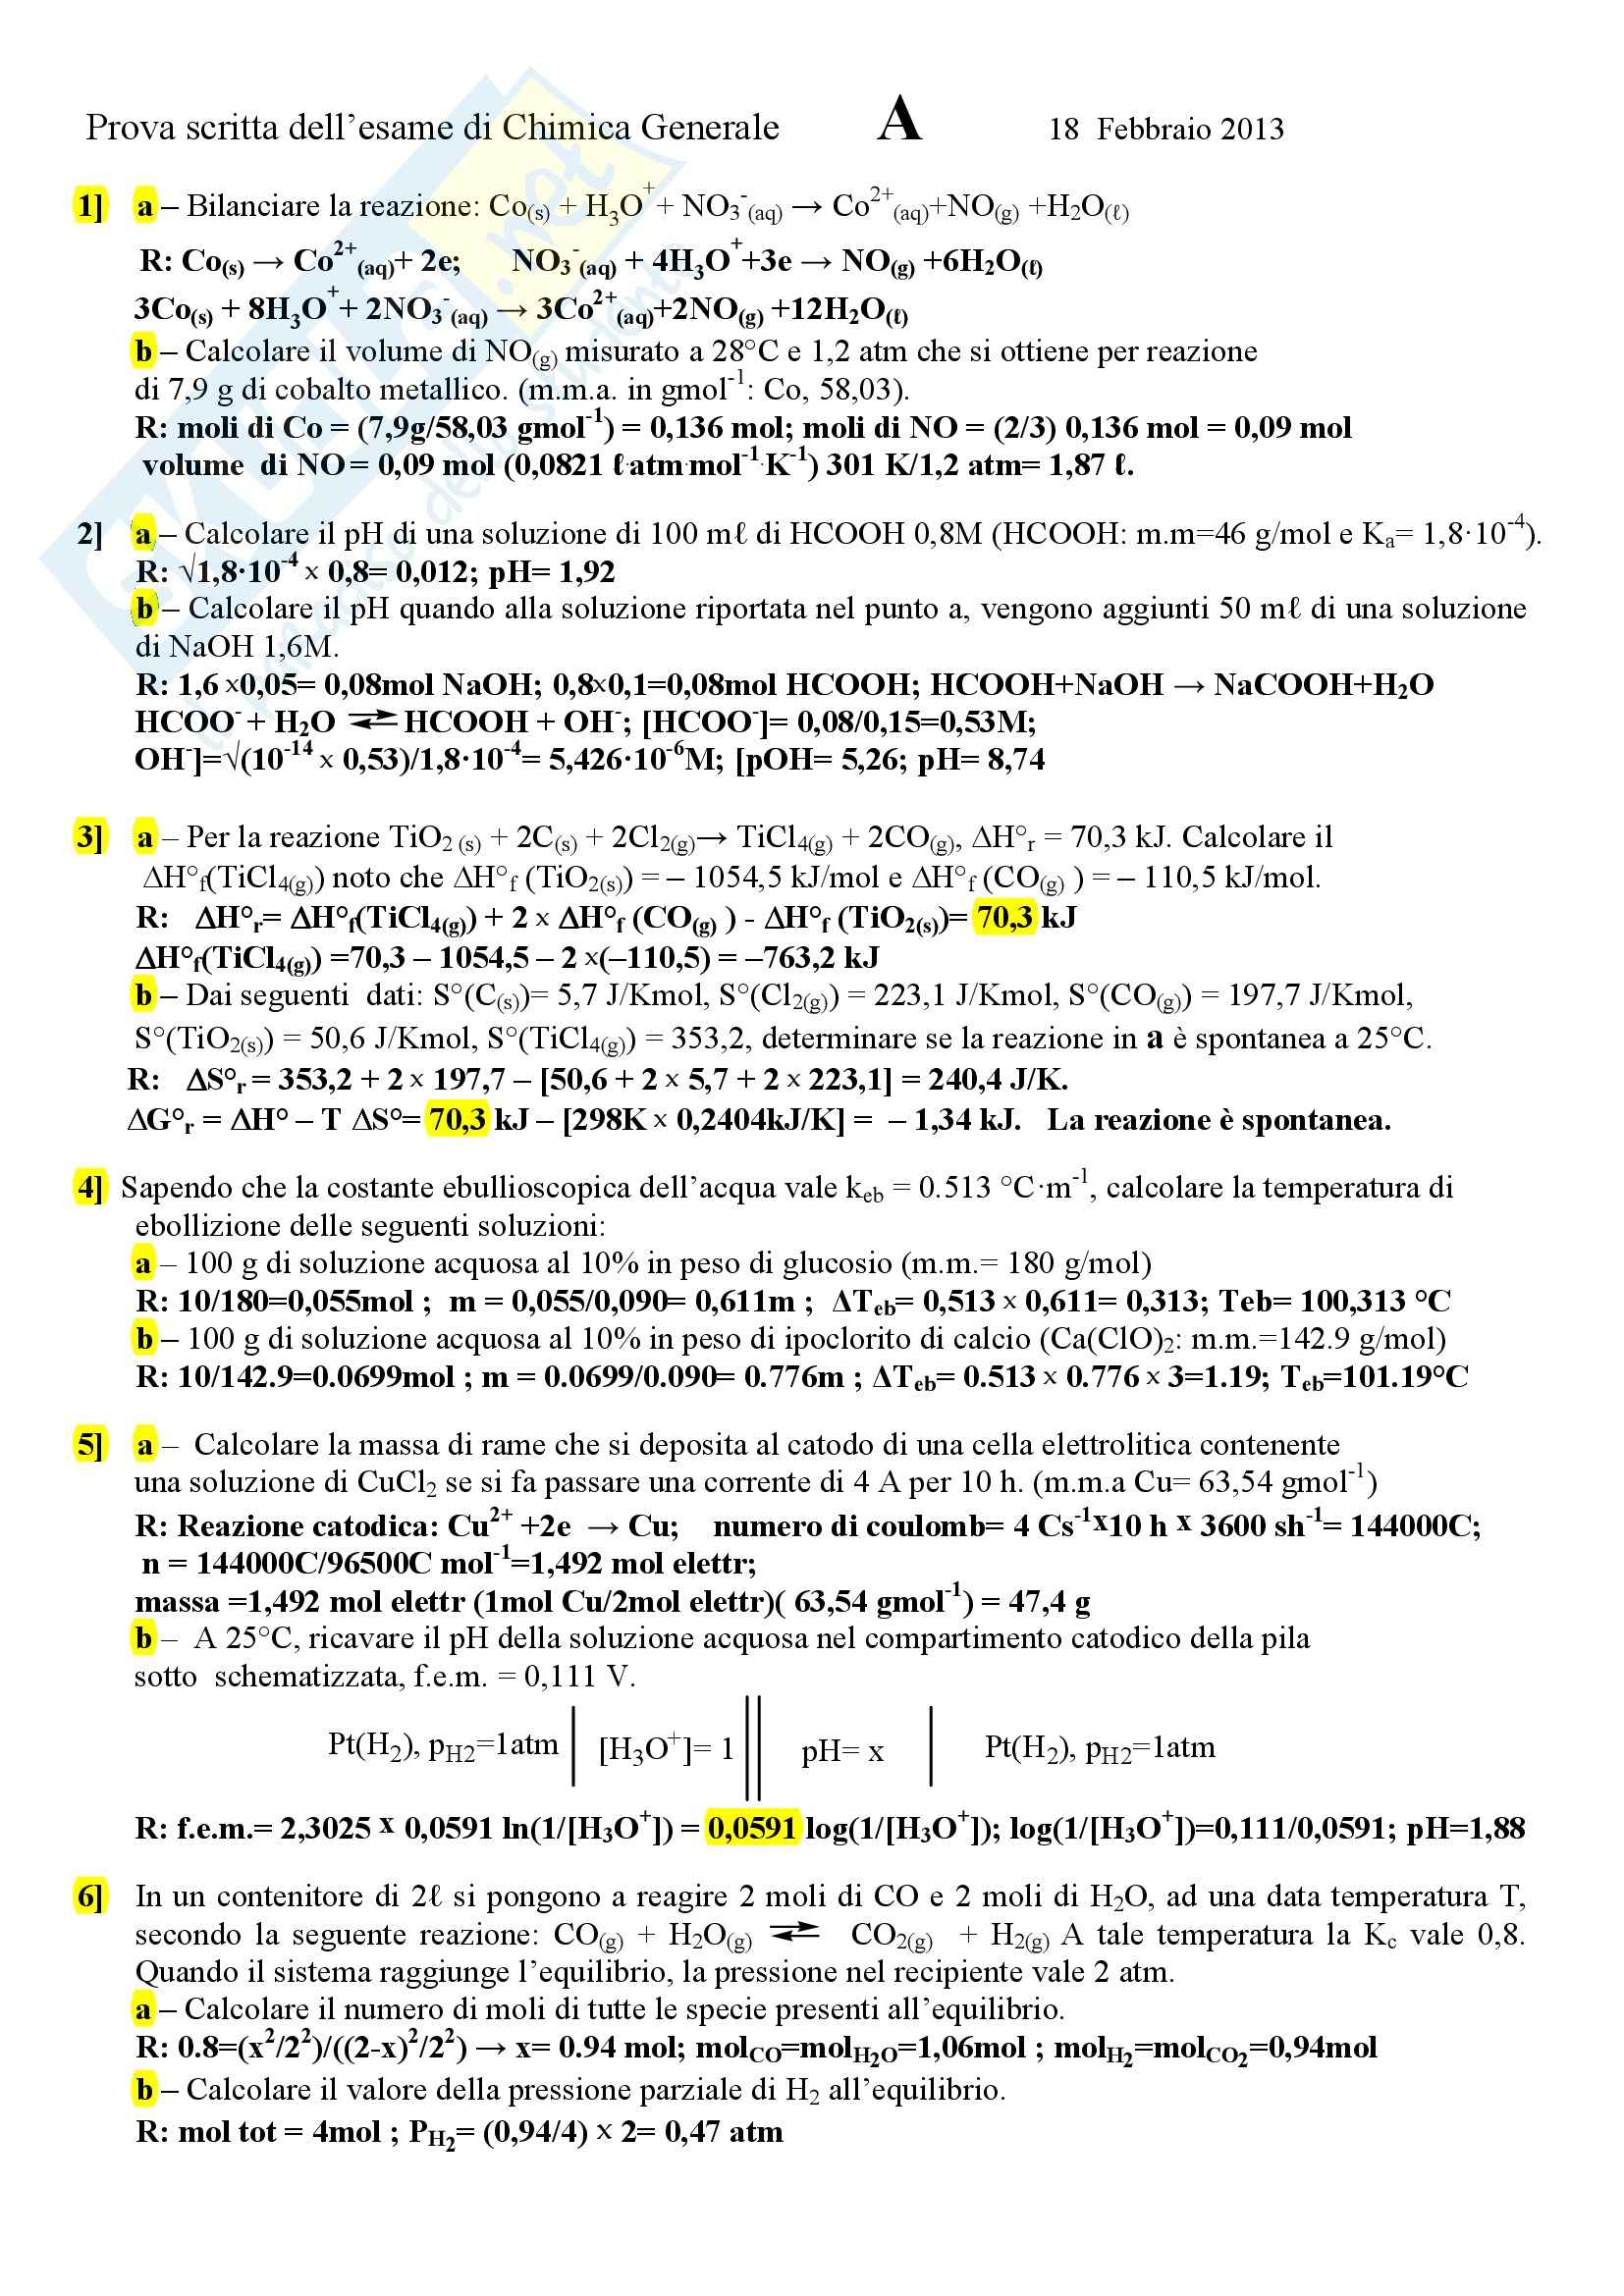 Chimica generale e inorganica - esercizi e soluzioni